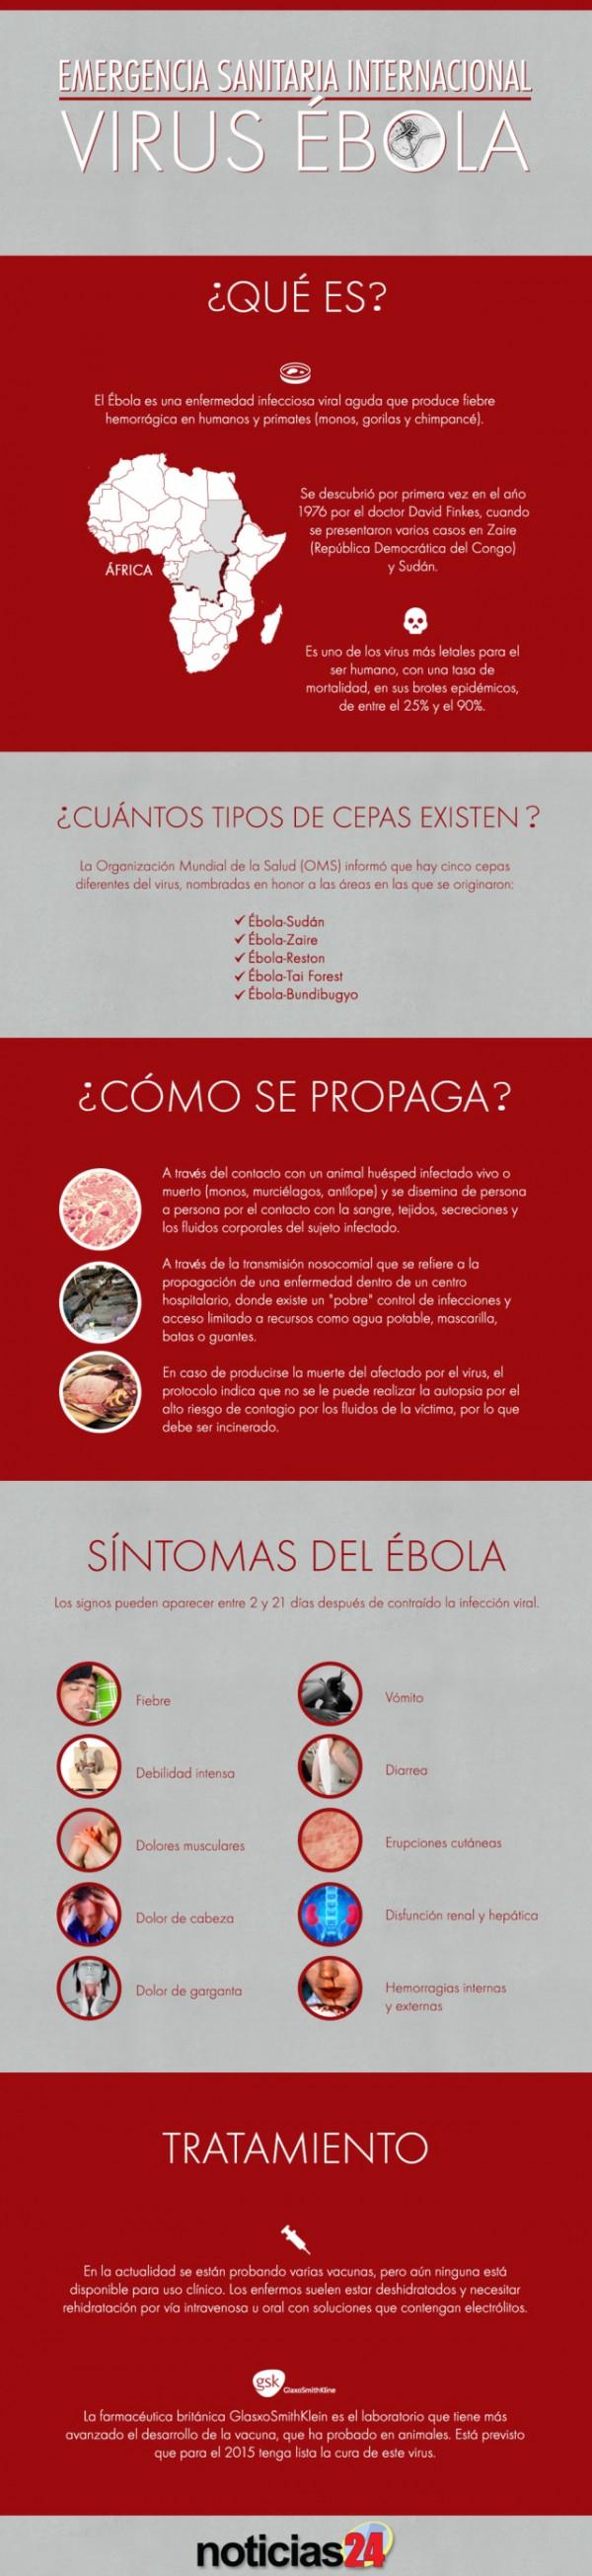 infografia-ebola